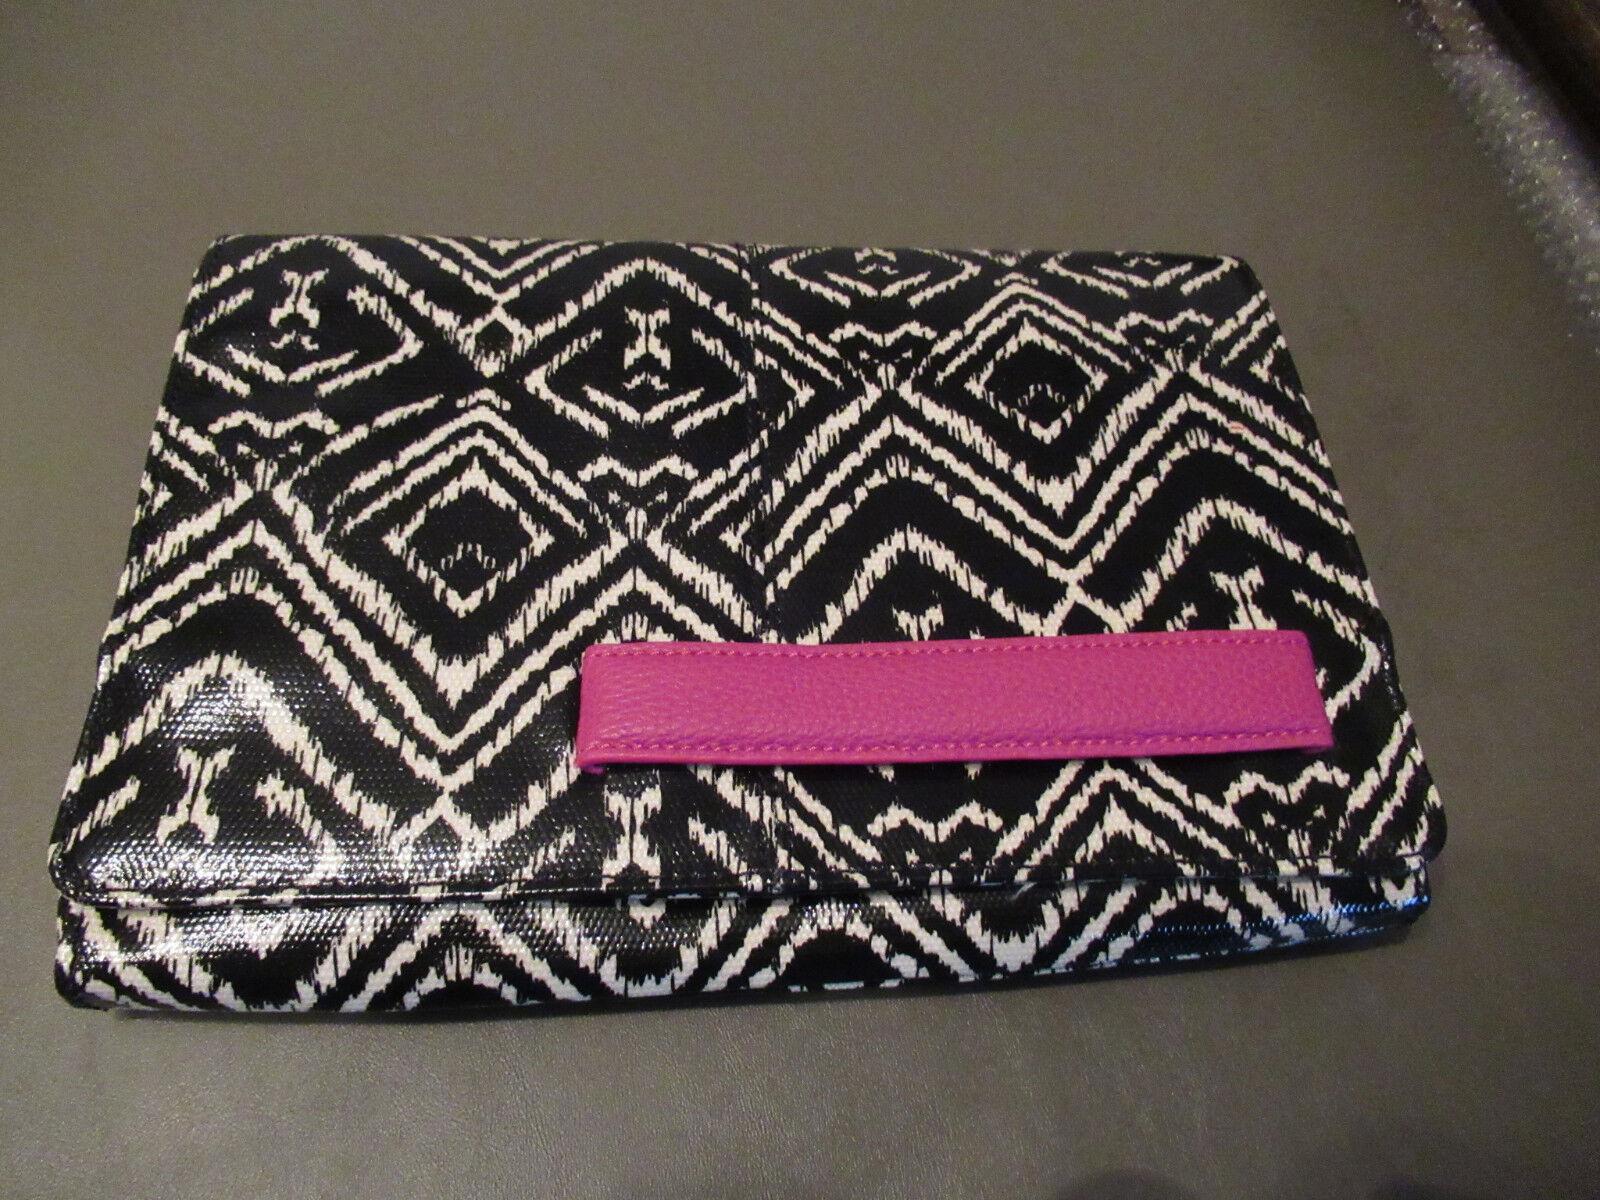 Steven by Steve Madden Bdraco Clutch Handbag, Black Multi, One Size